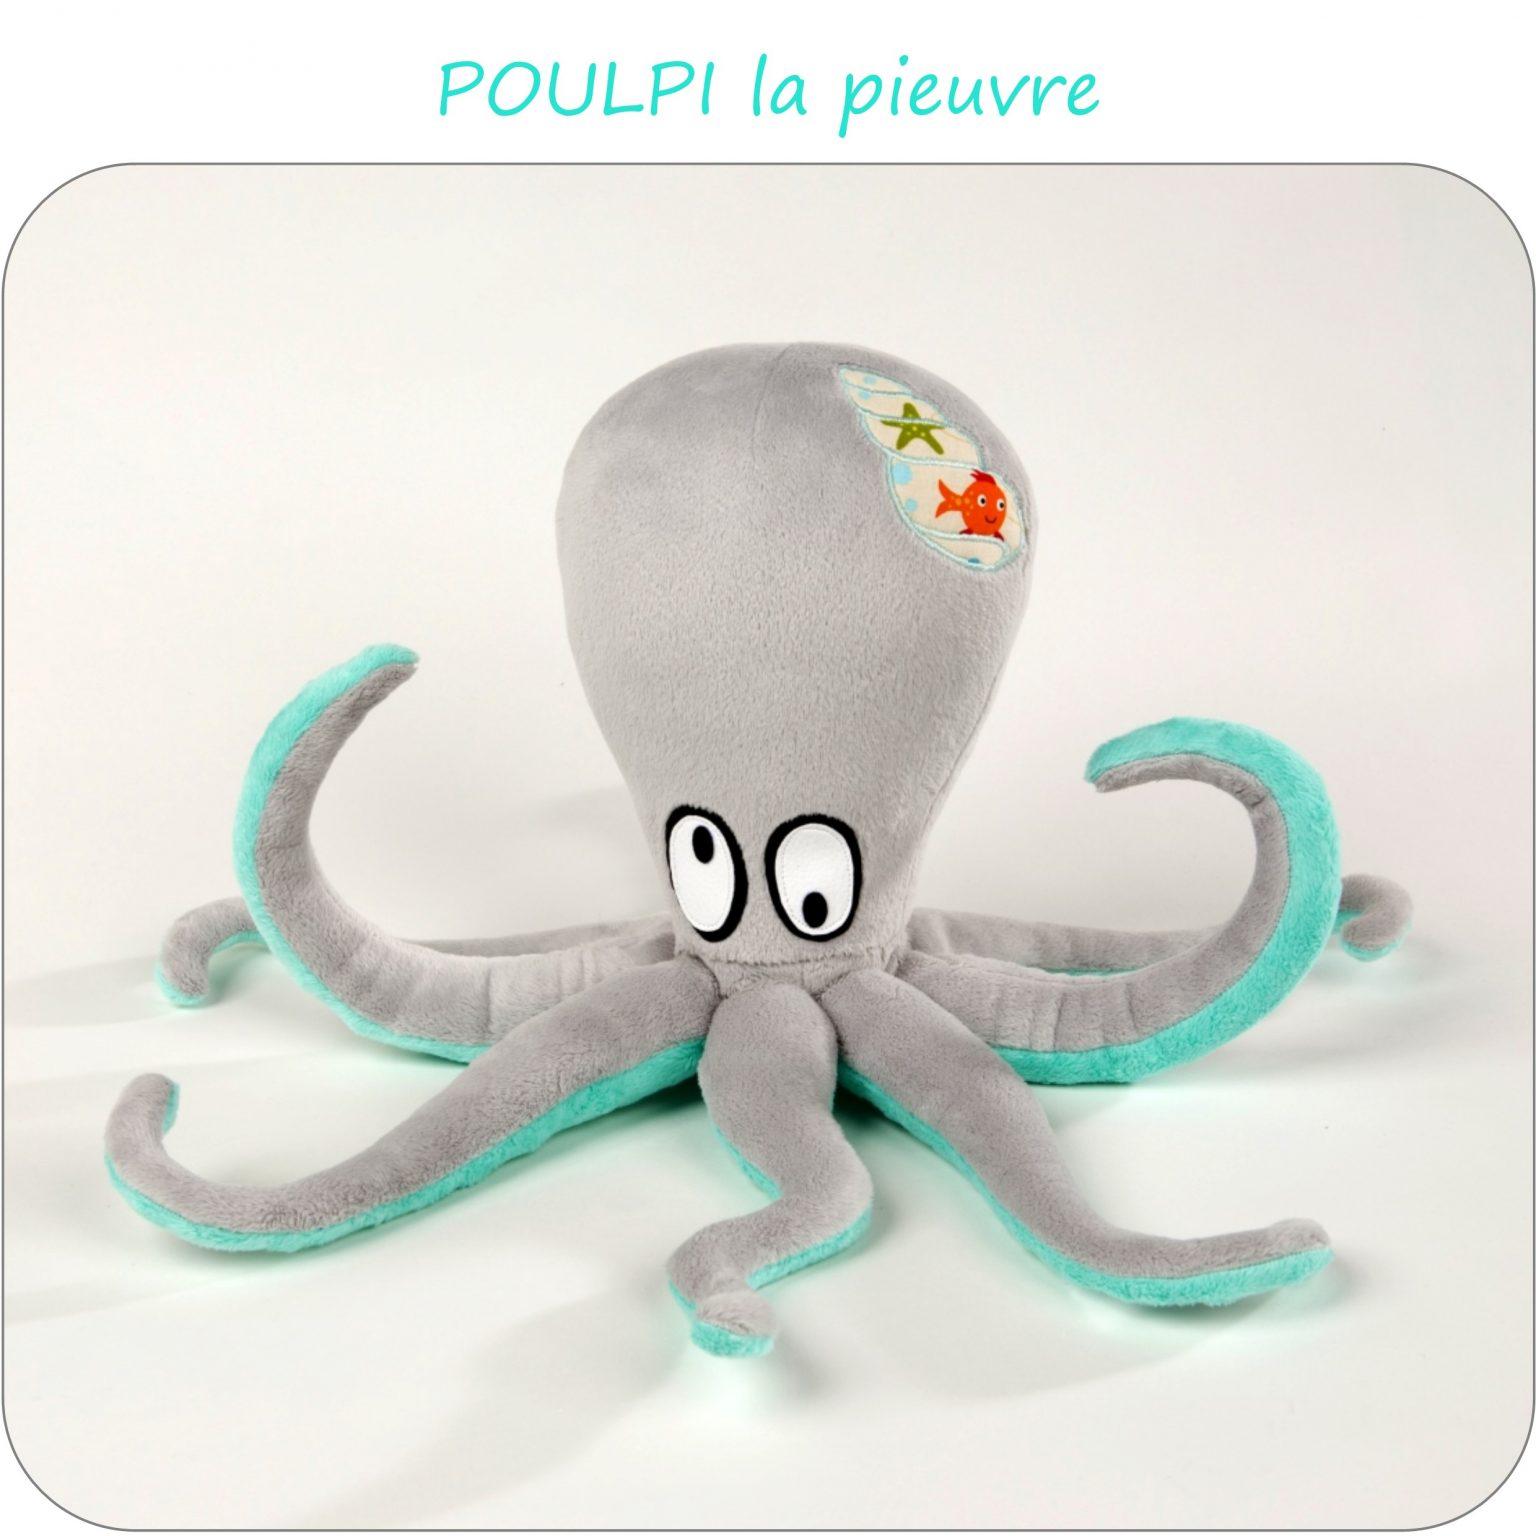 POULPI-PresentationSite_PetitsDom